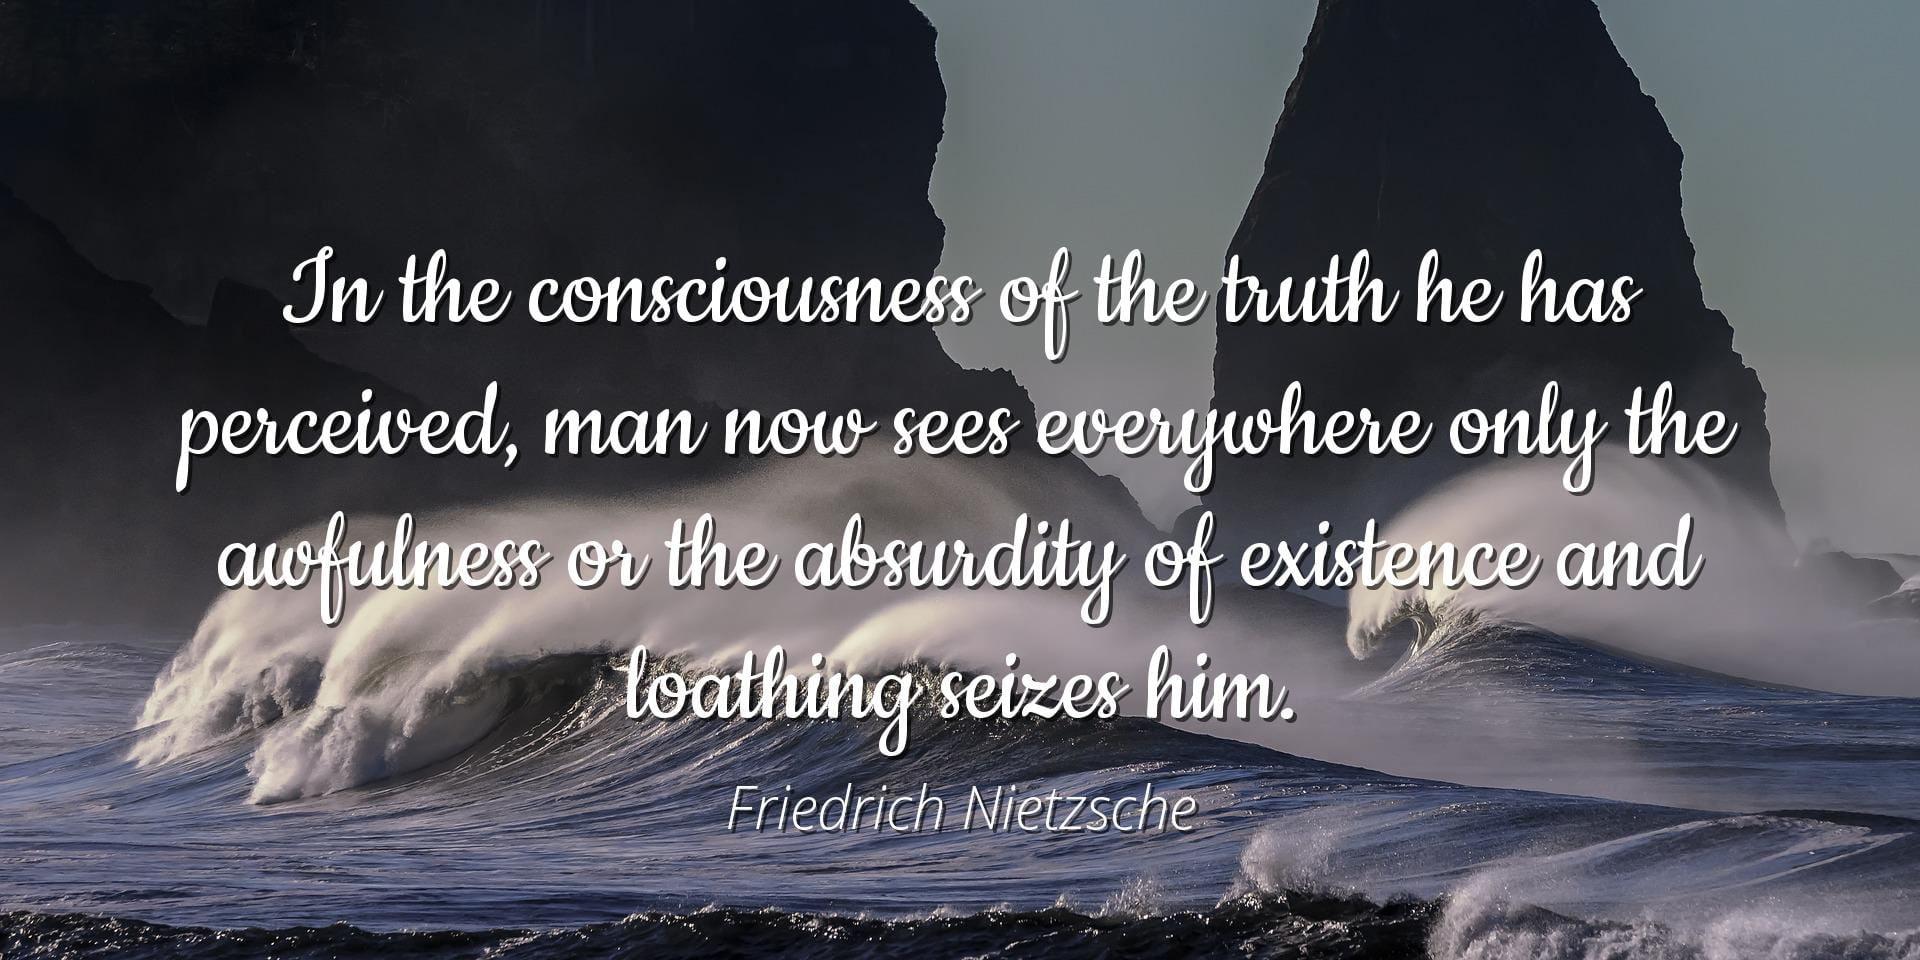 Friedrich Nietzsche Famous Quotes Laminated Poster Print 24x20